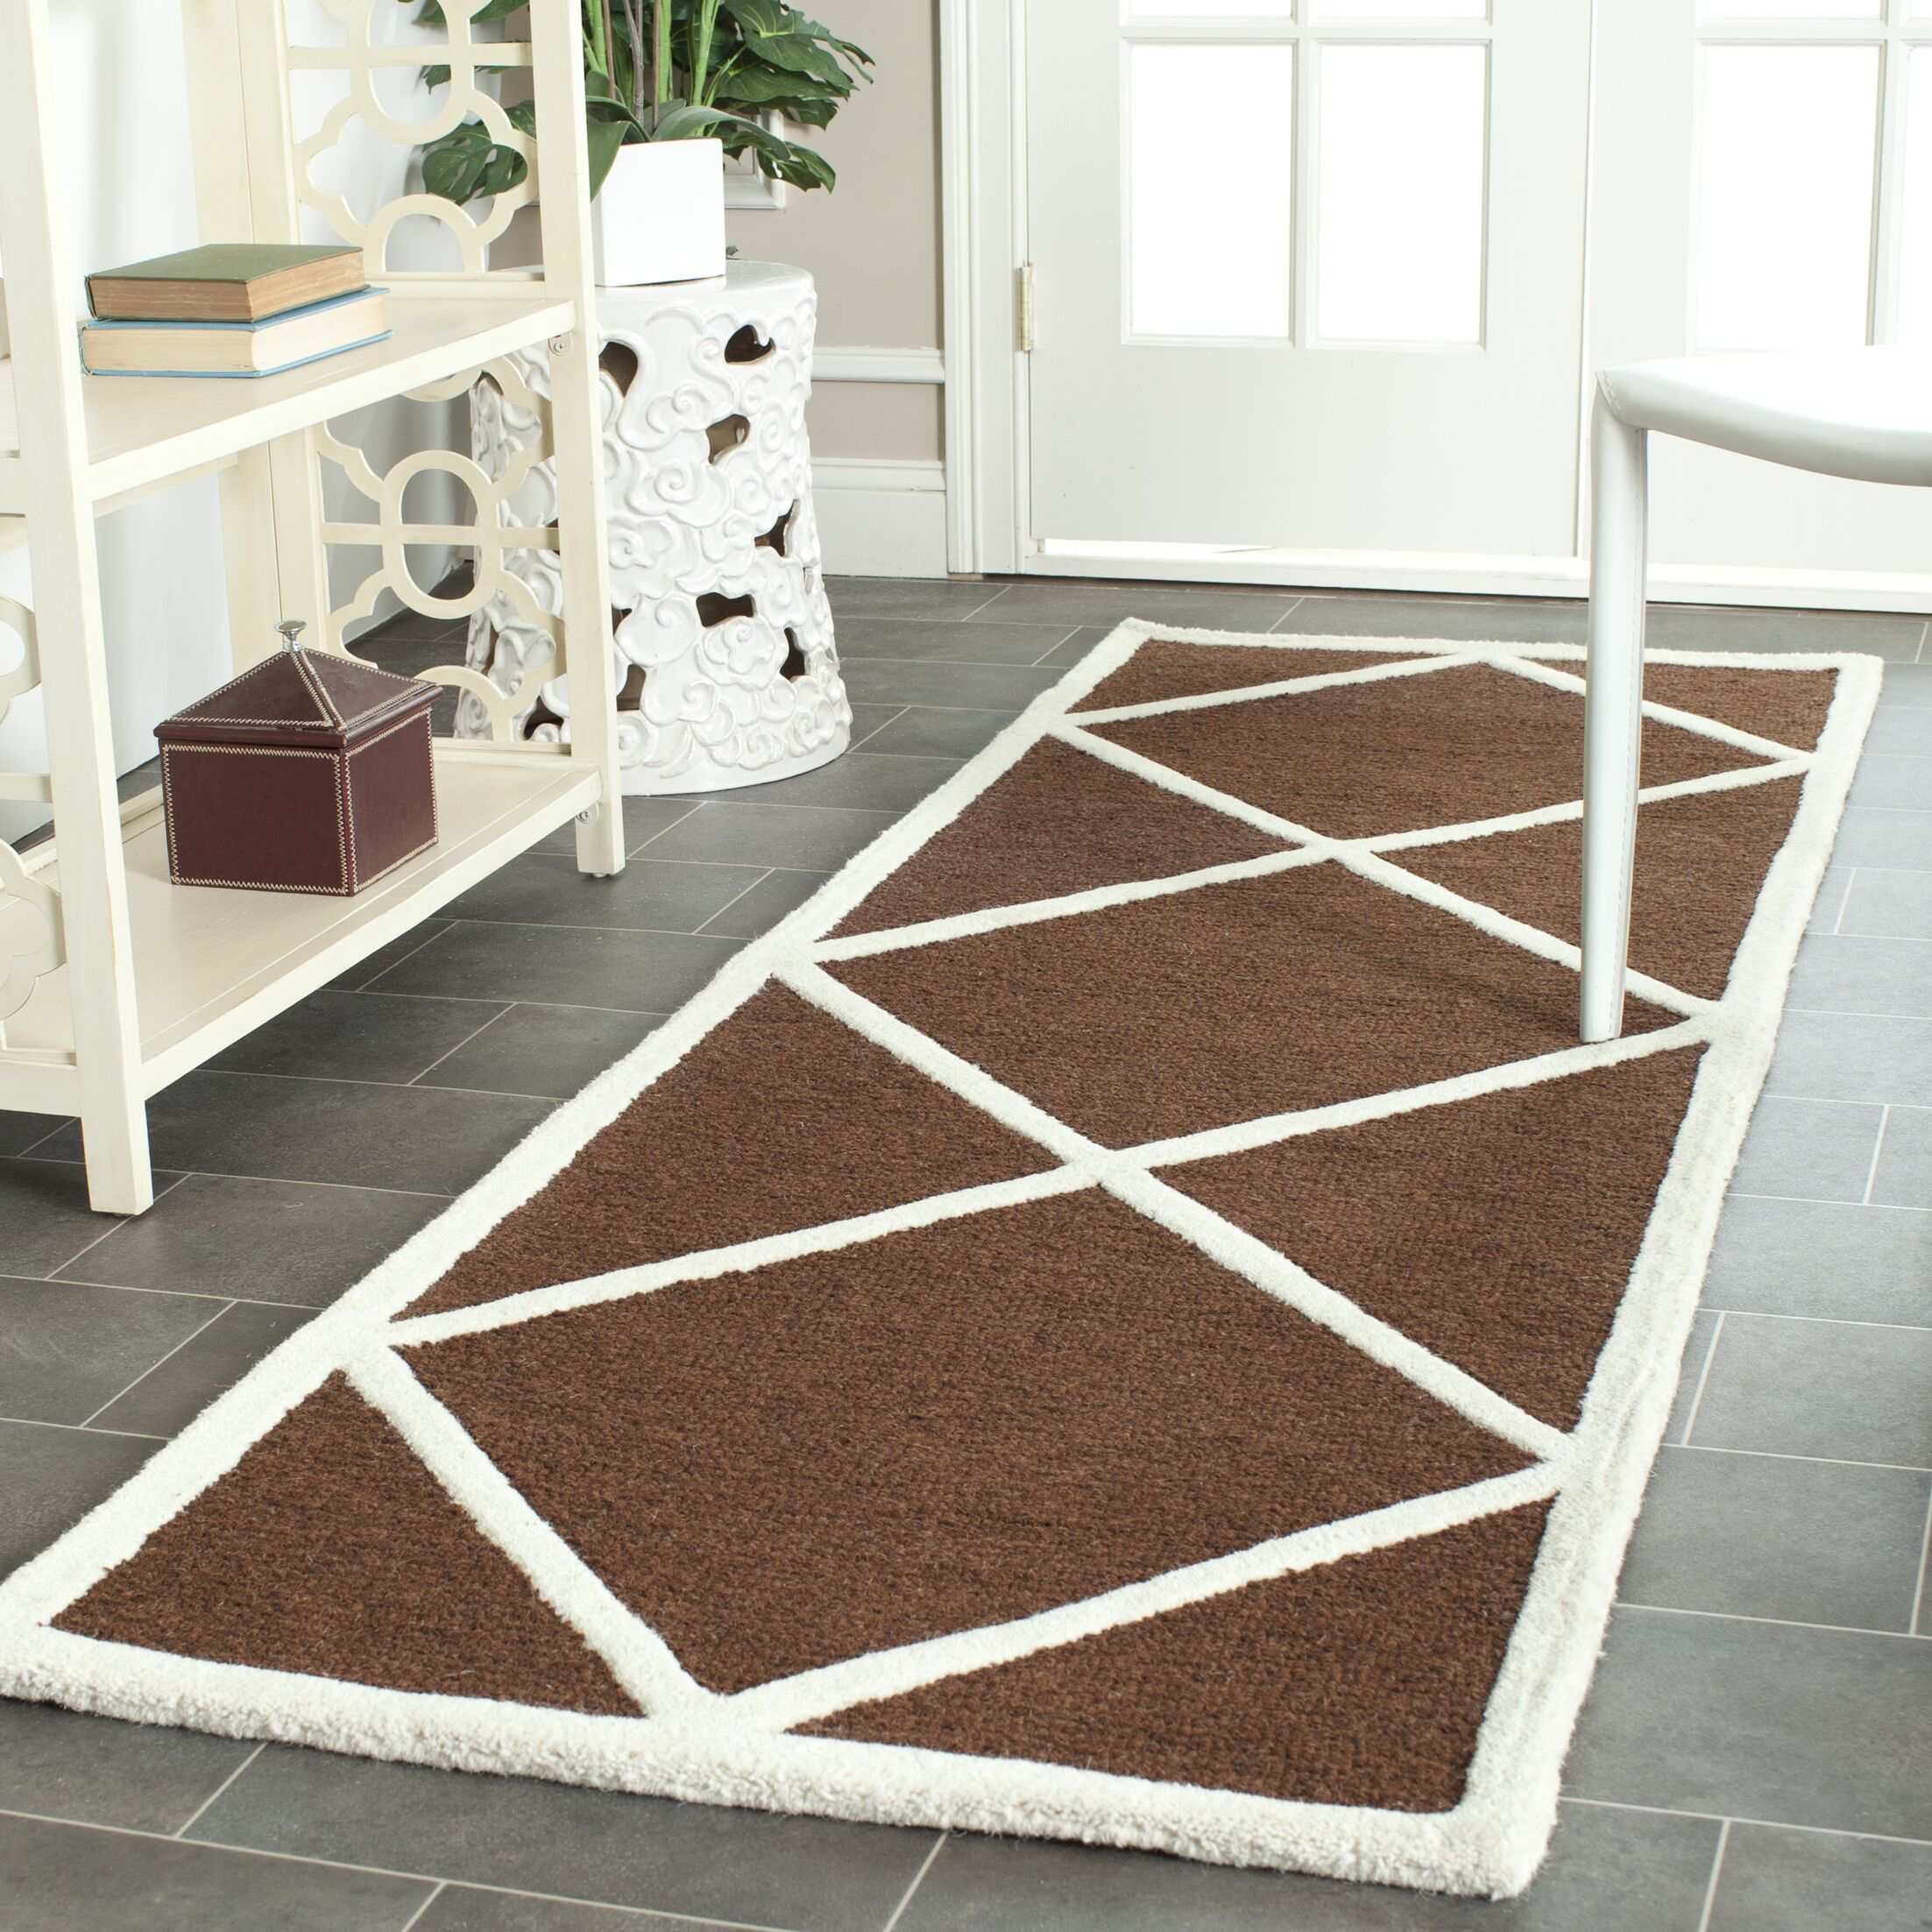 Darla Hand-Tufted Wool Dark Brown/Ivory Area Rug Rug Size: Rectangle 4' x 6'